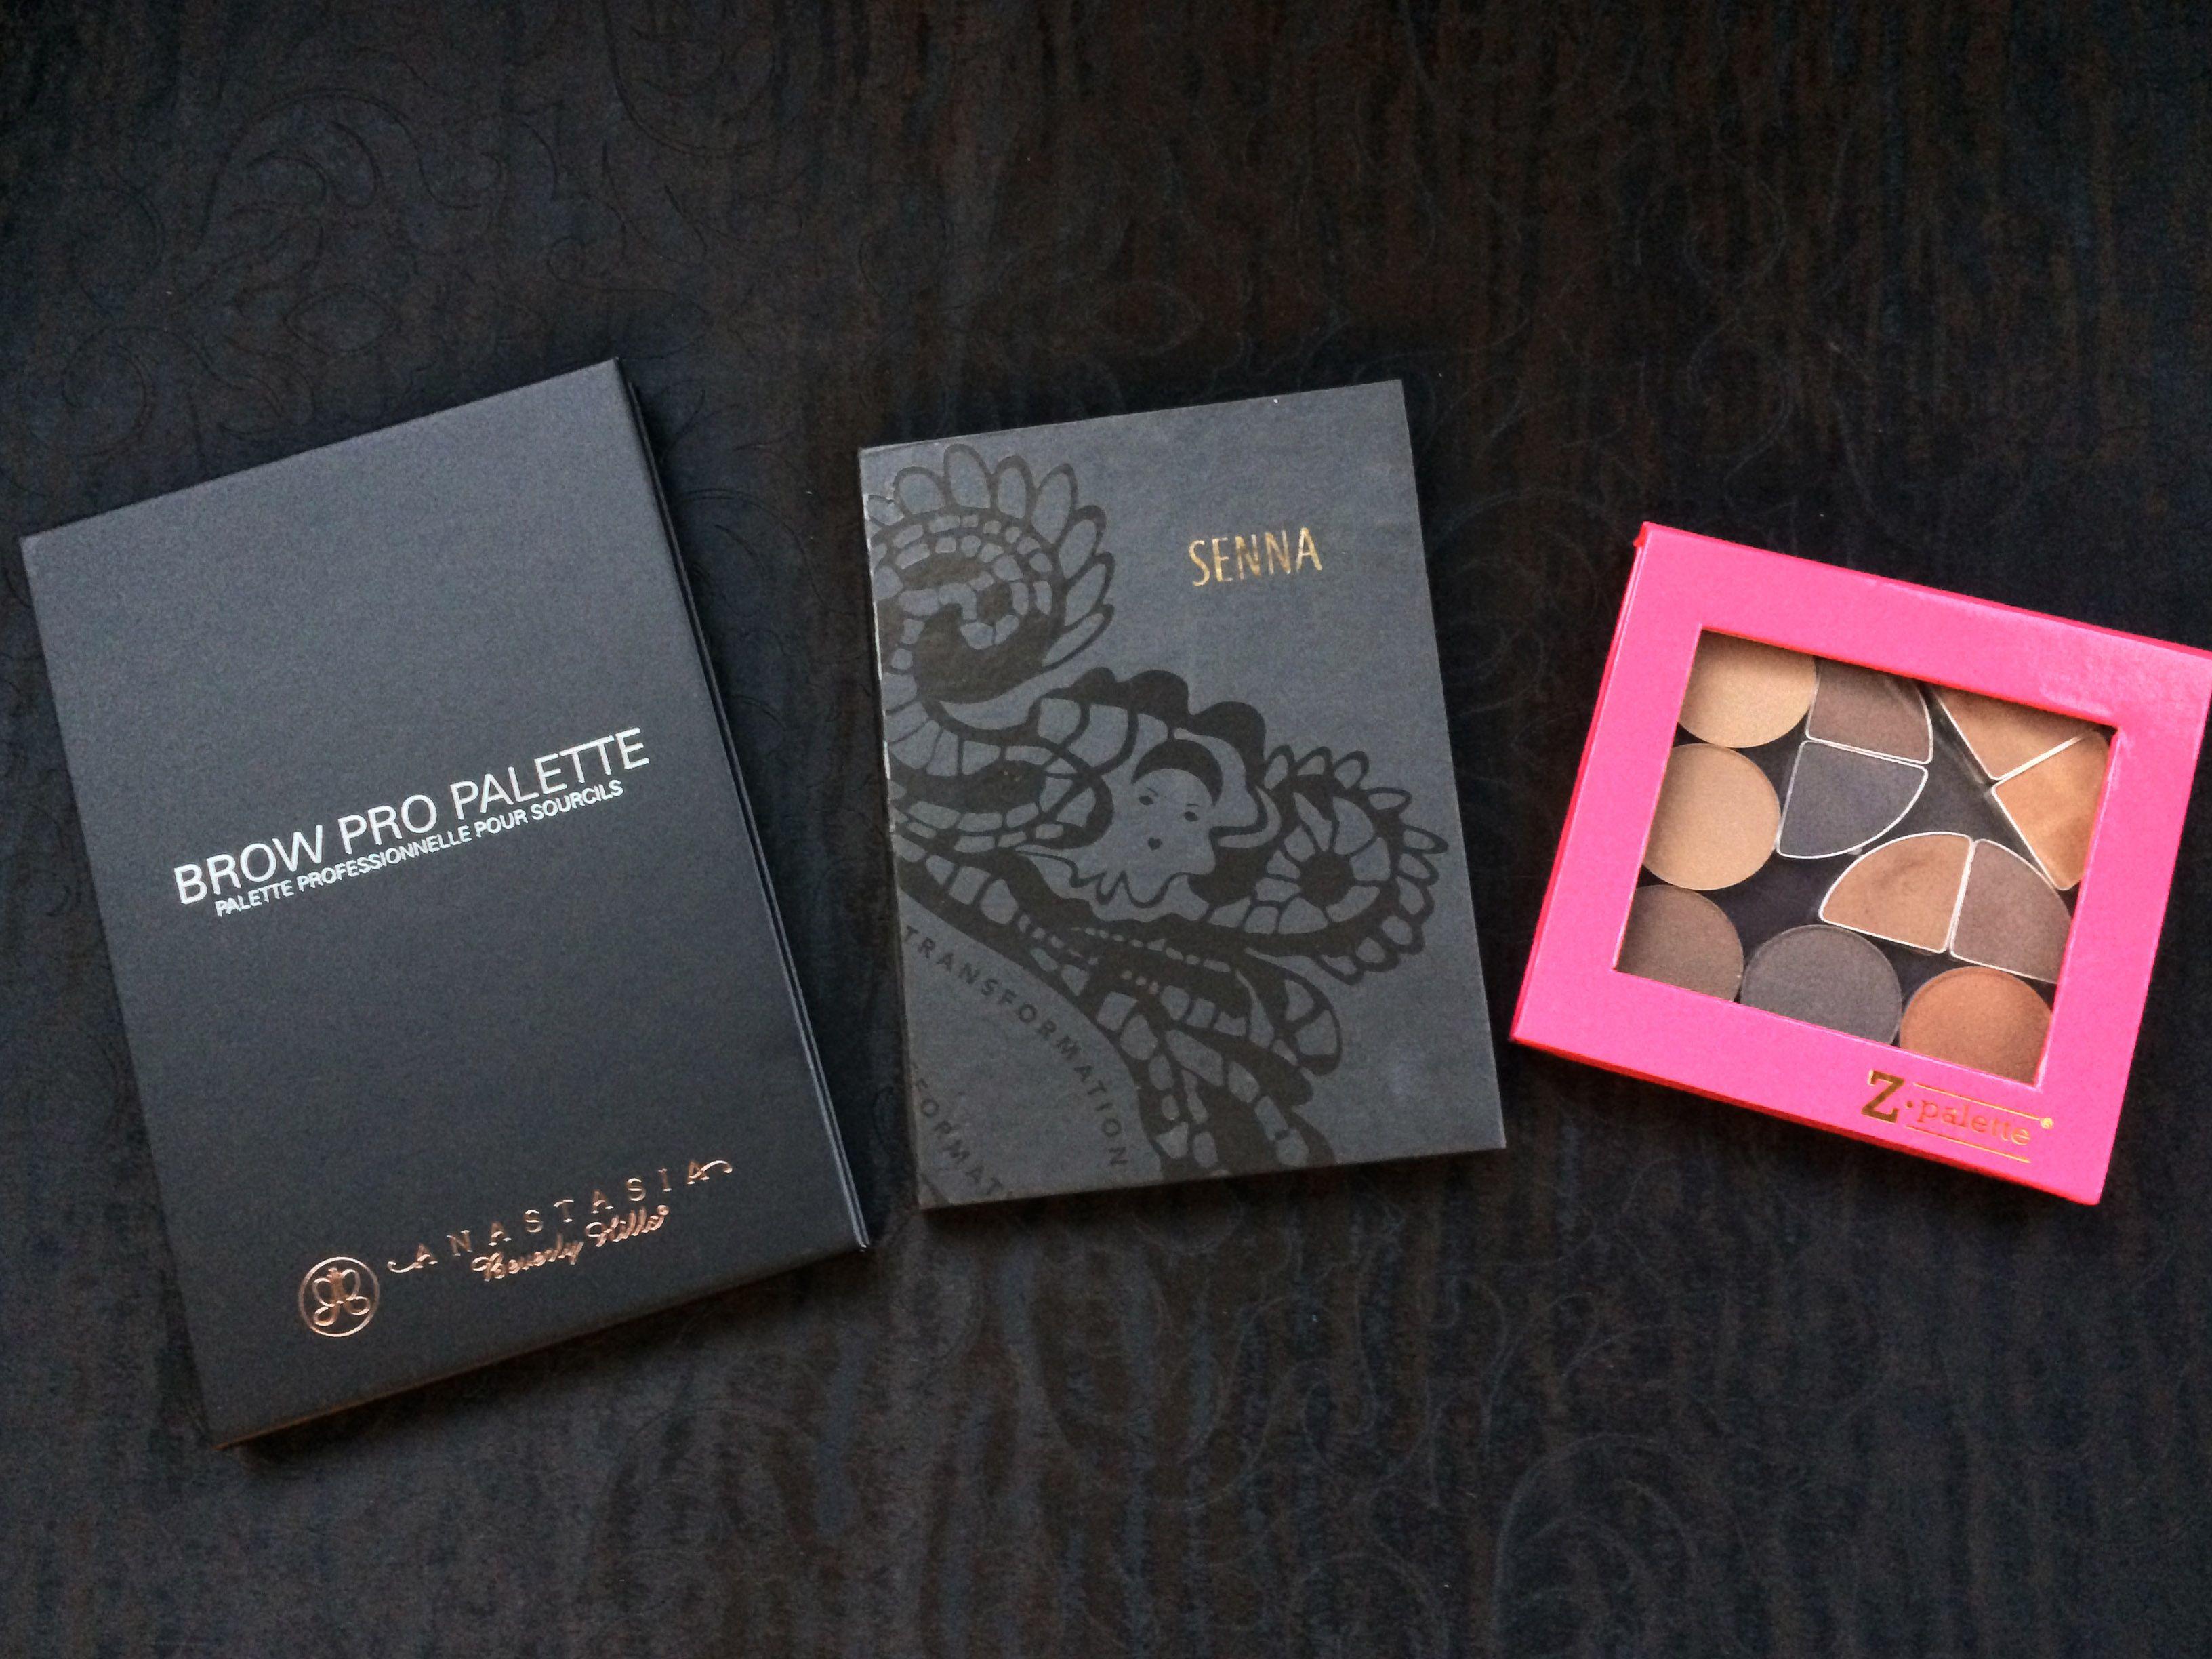 Anastasia Brow Pro Palette Senna Brow Book Body Shop Brow Kits And